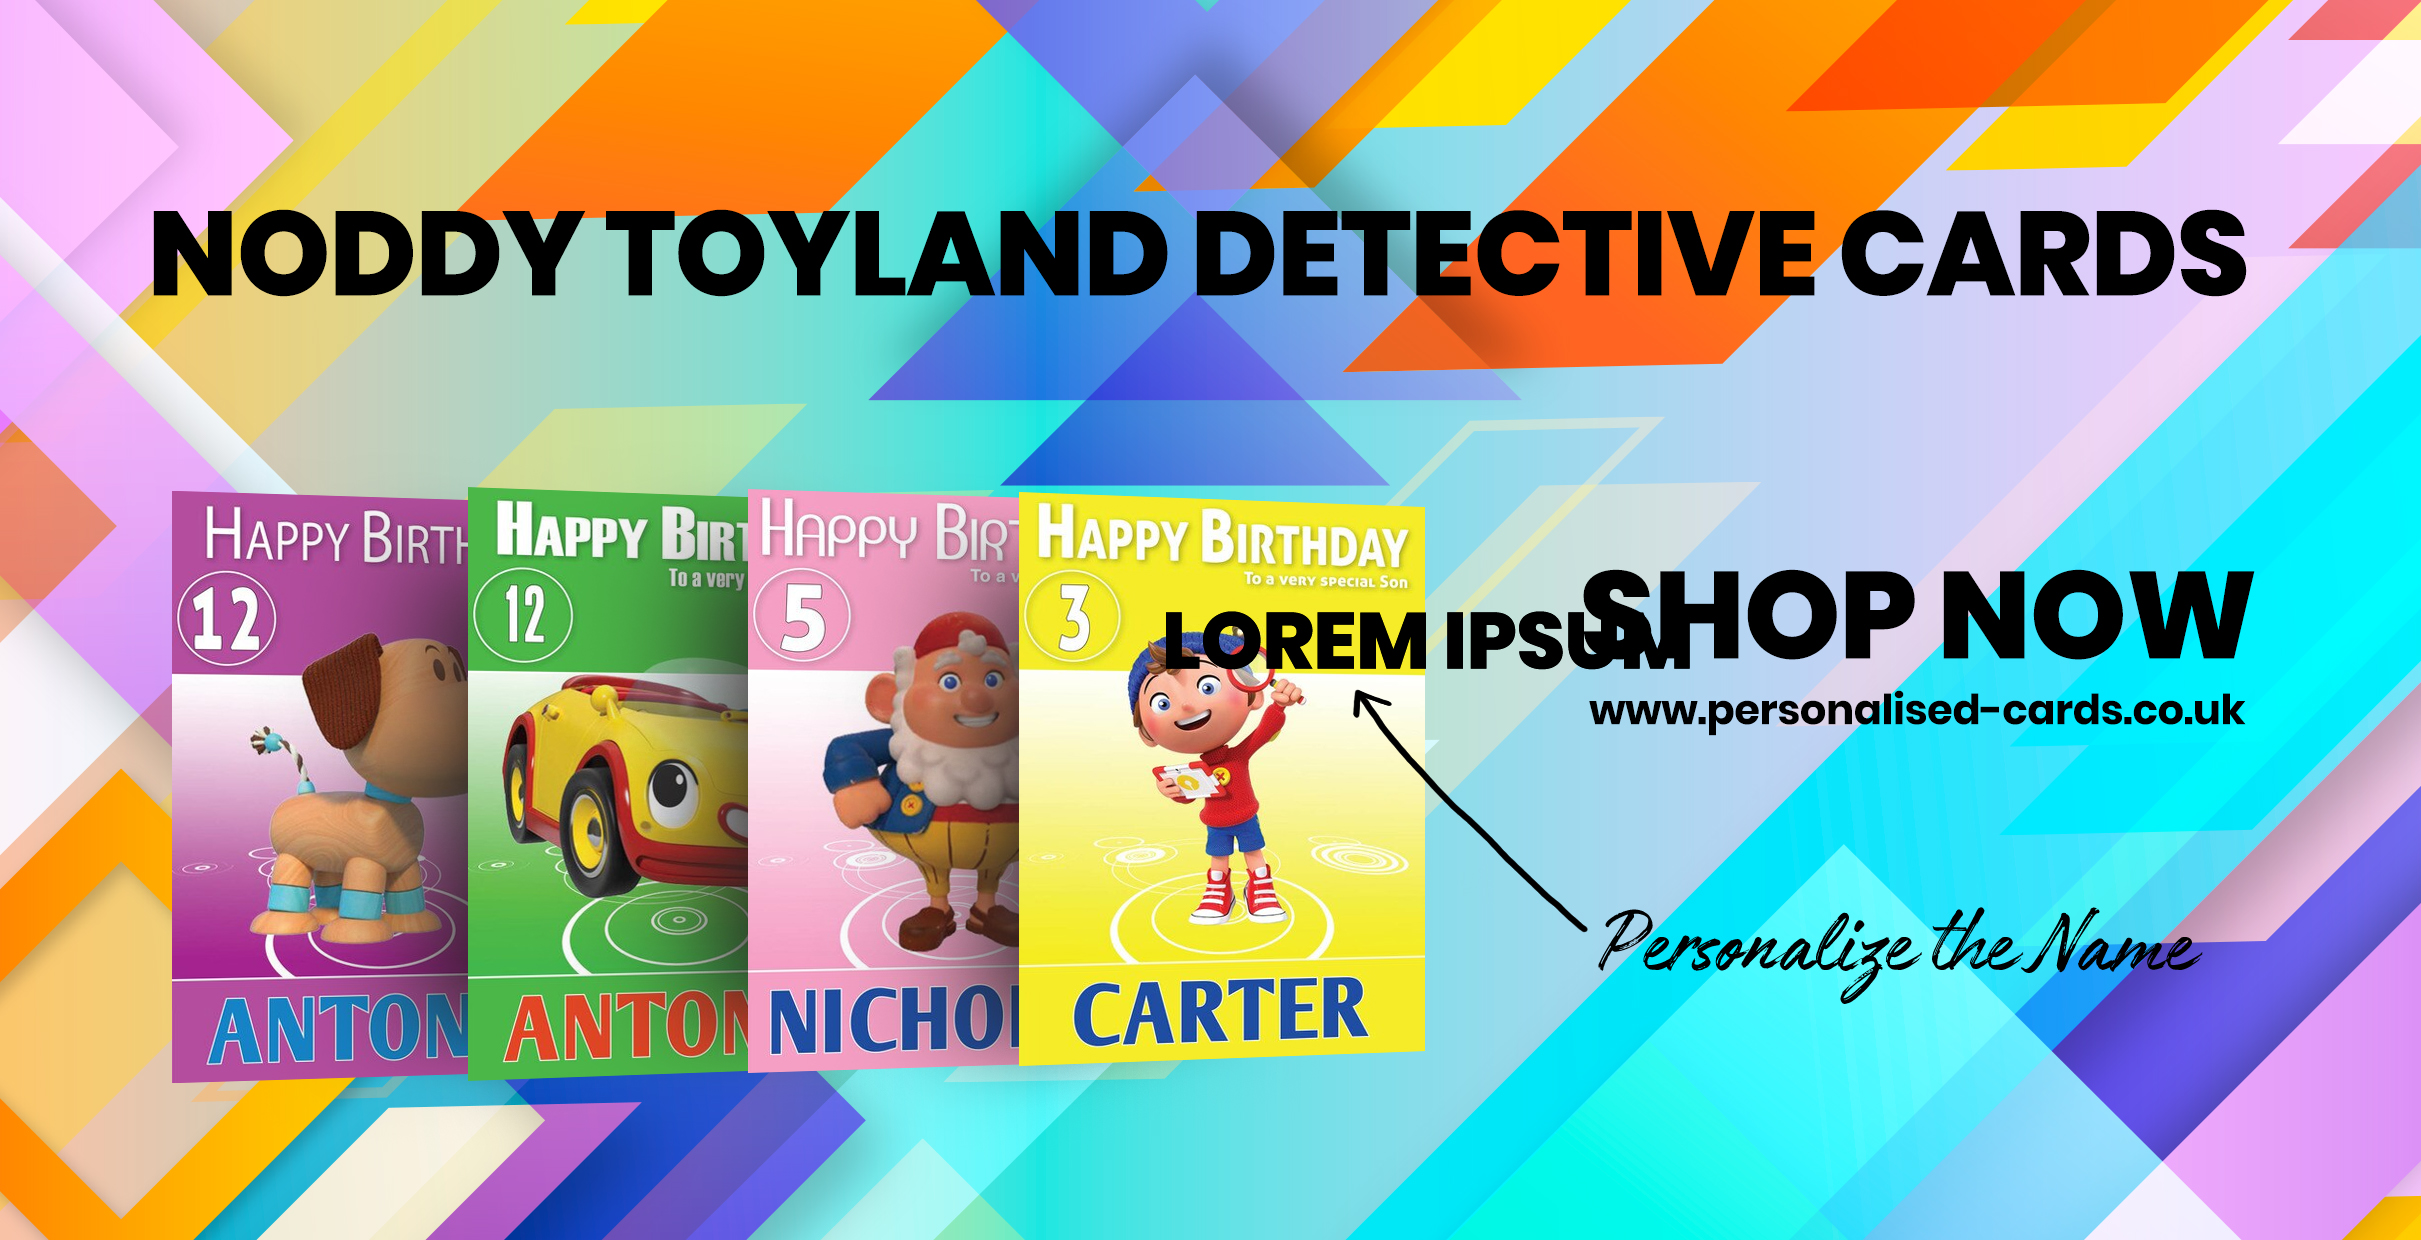 noddy-toyland-detective-cards.jpg